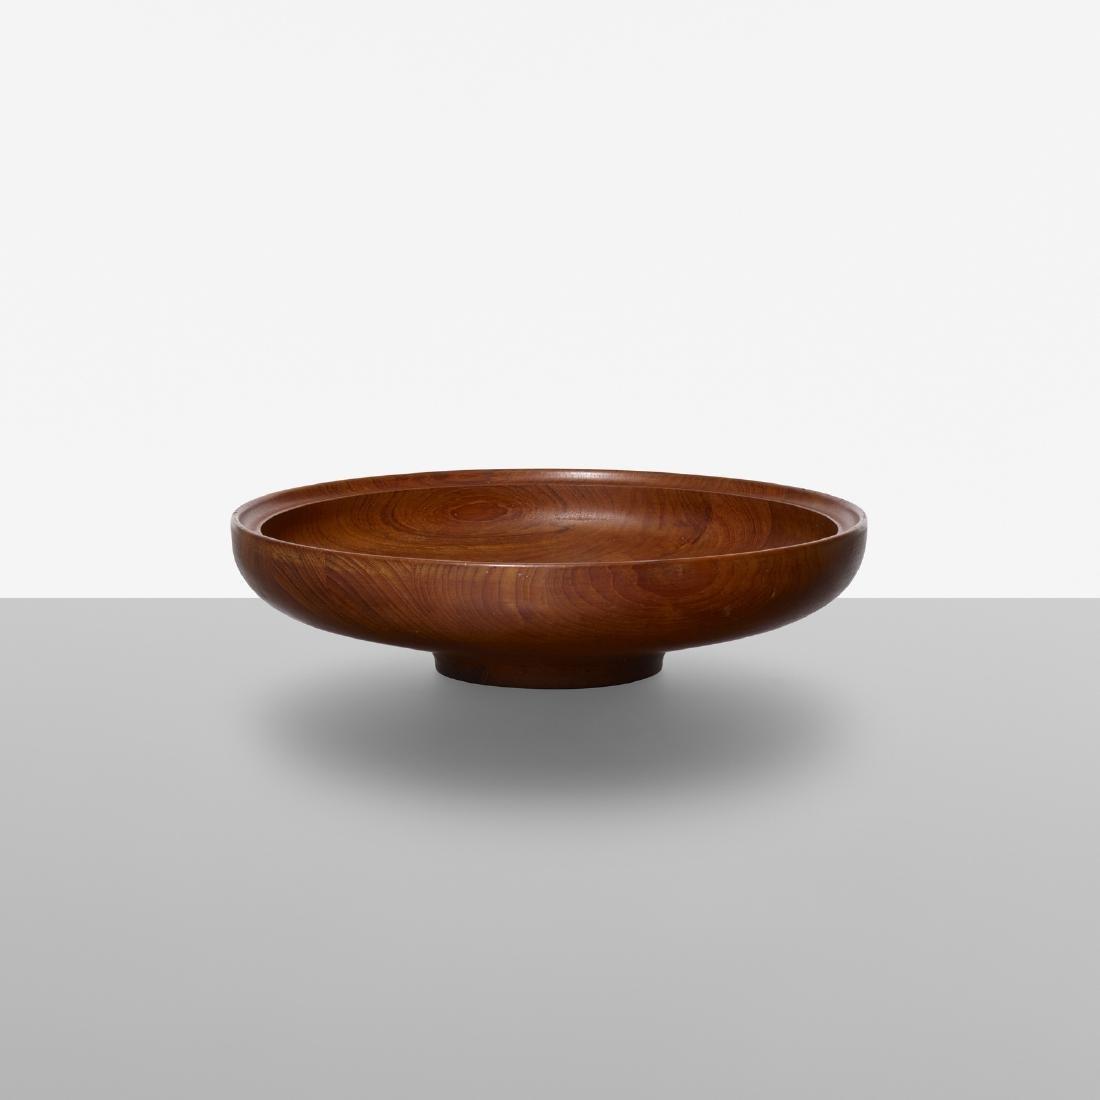 Henning Koppel, bowl